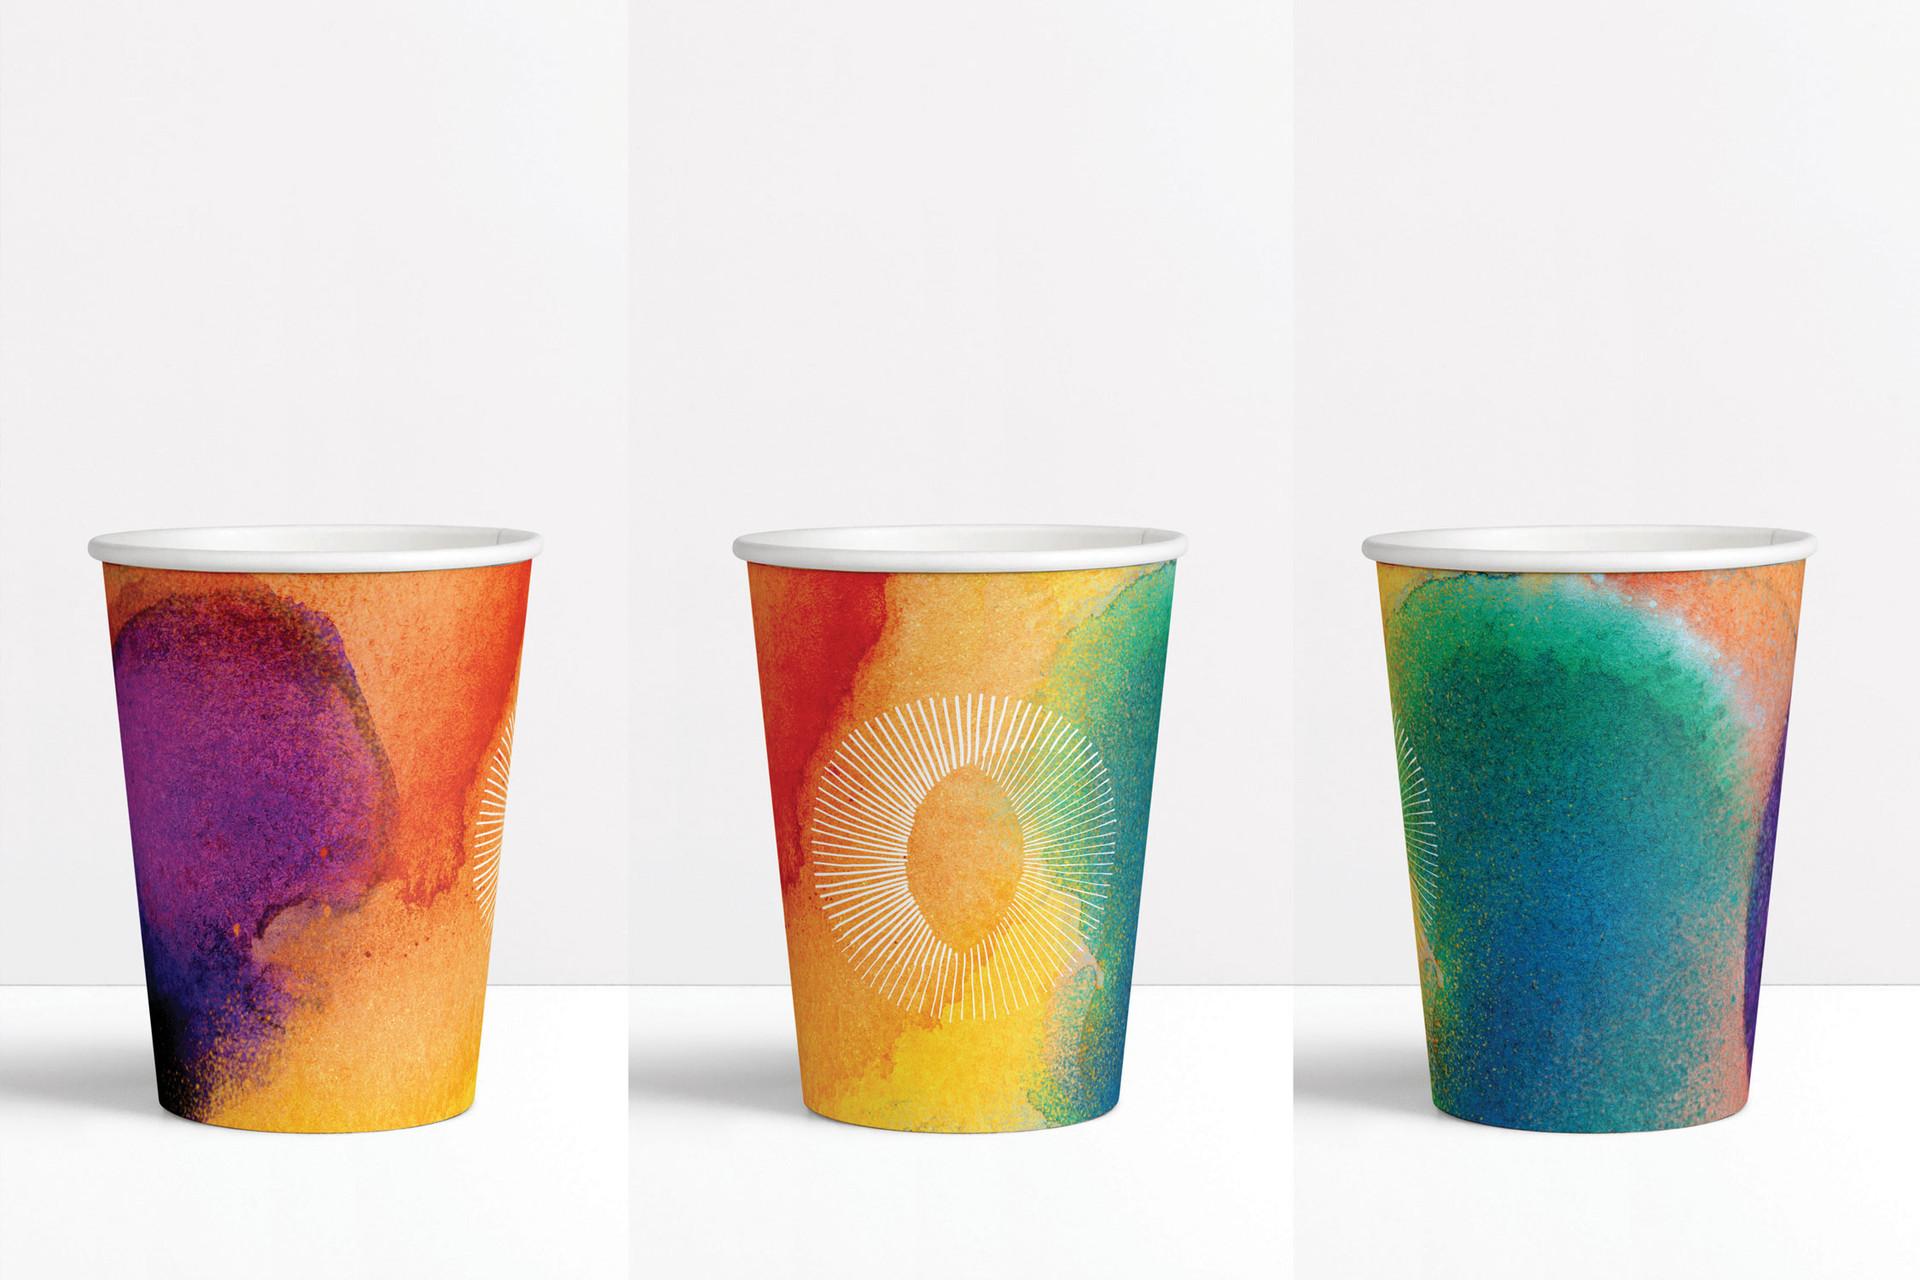 Horizonal-Coffee-Cup.jpg